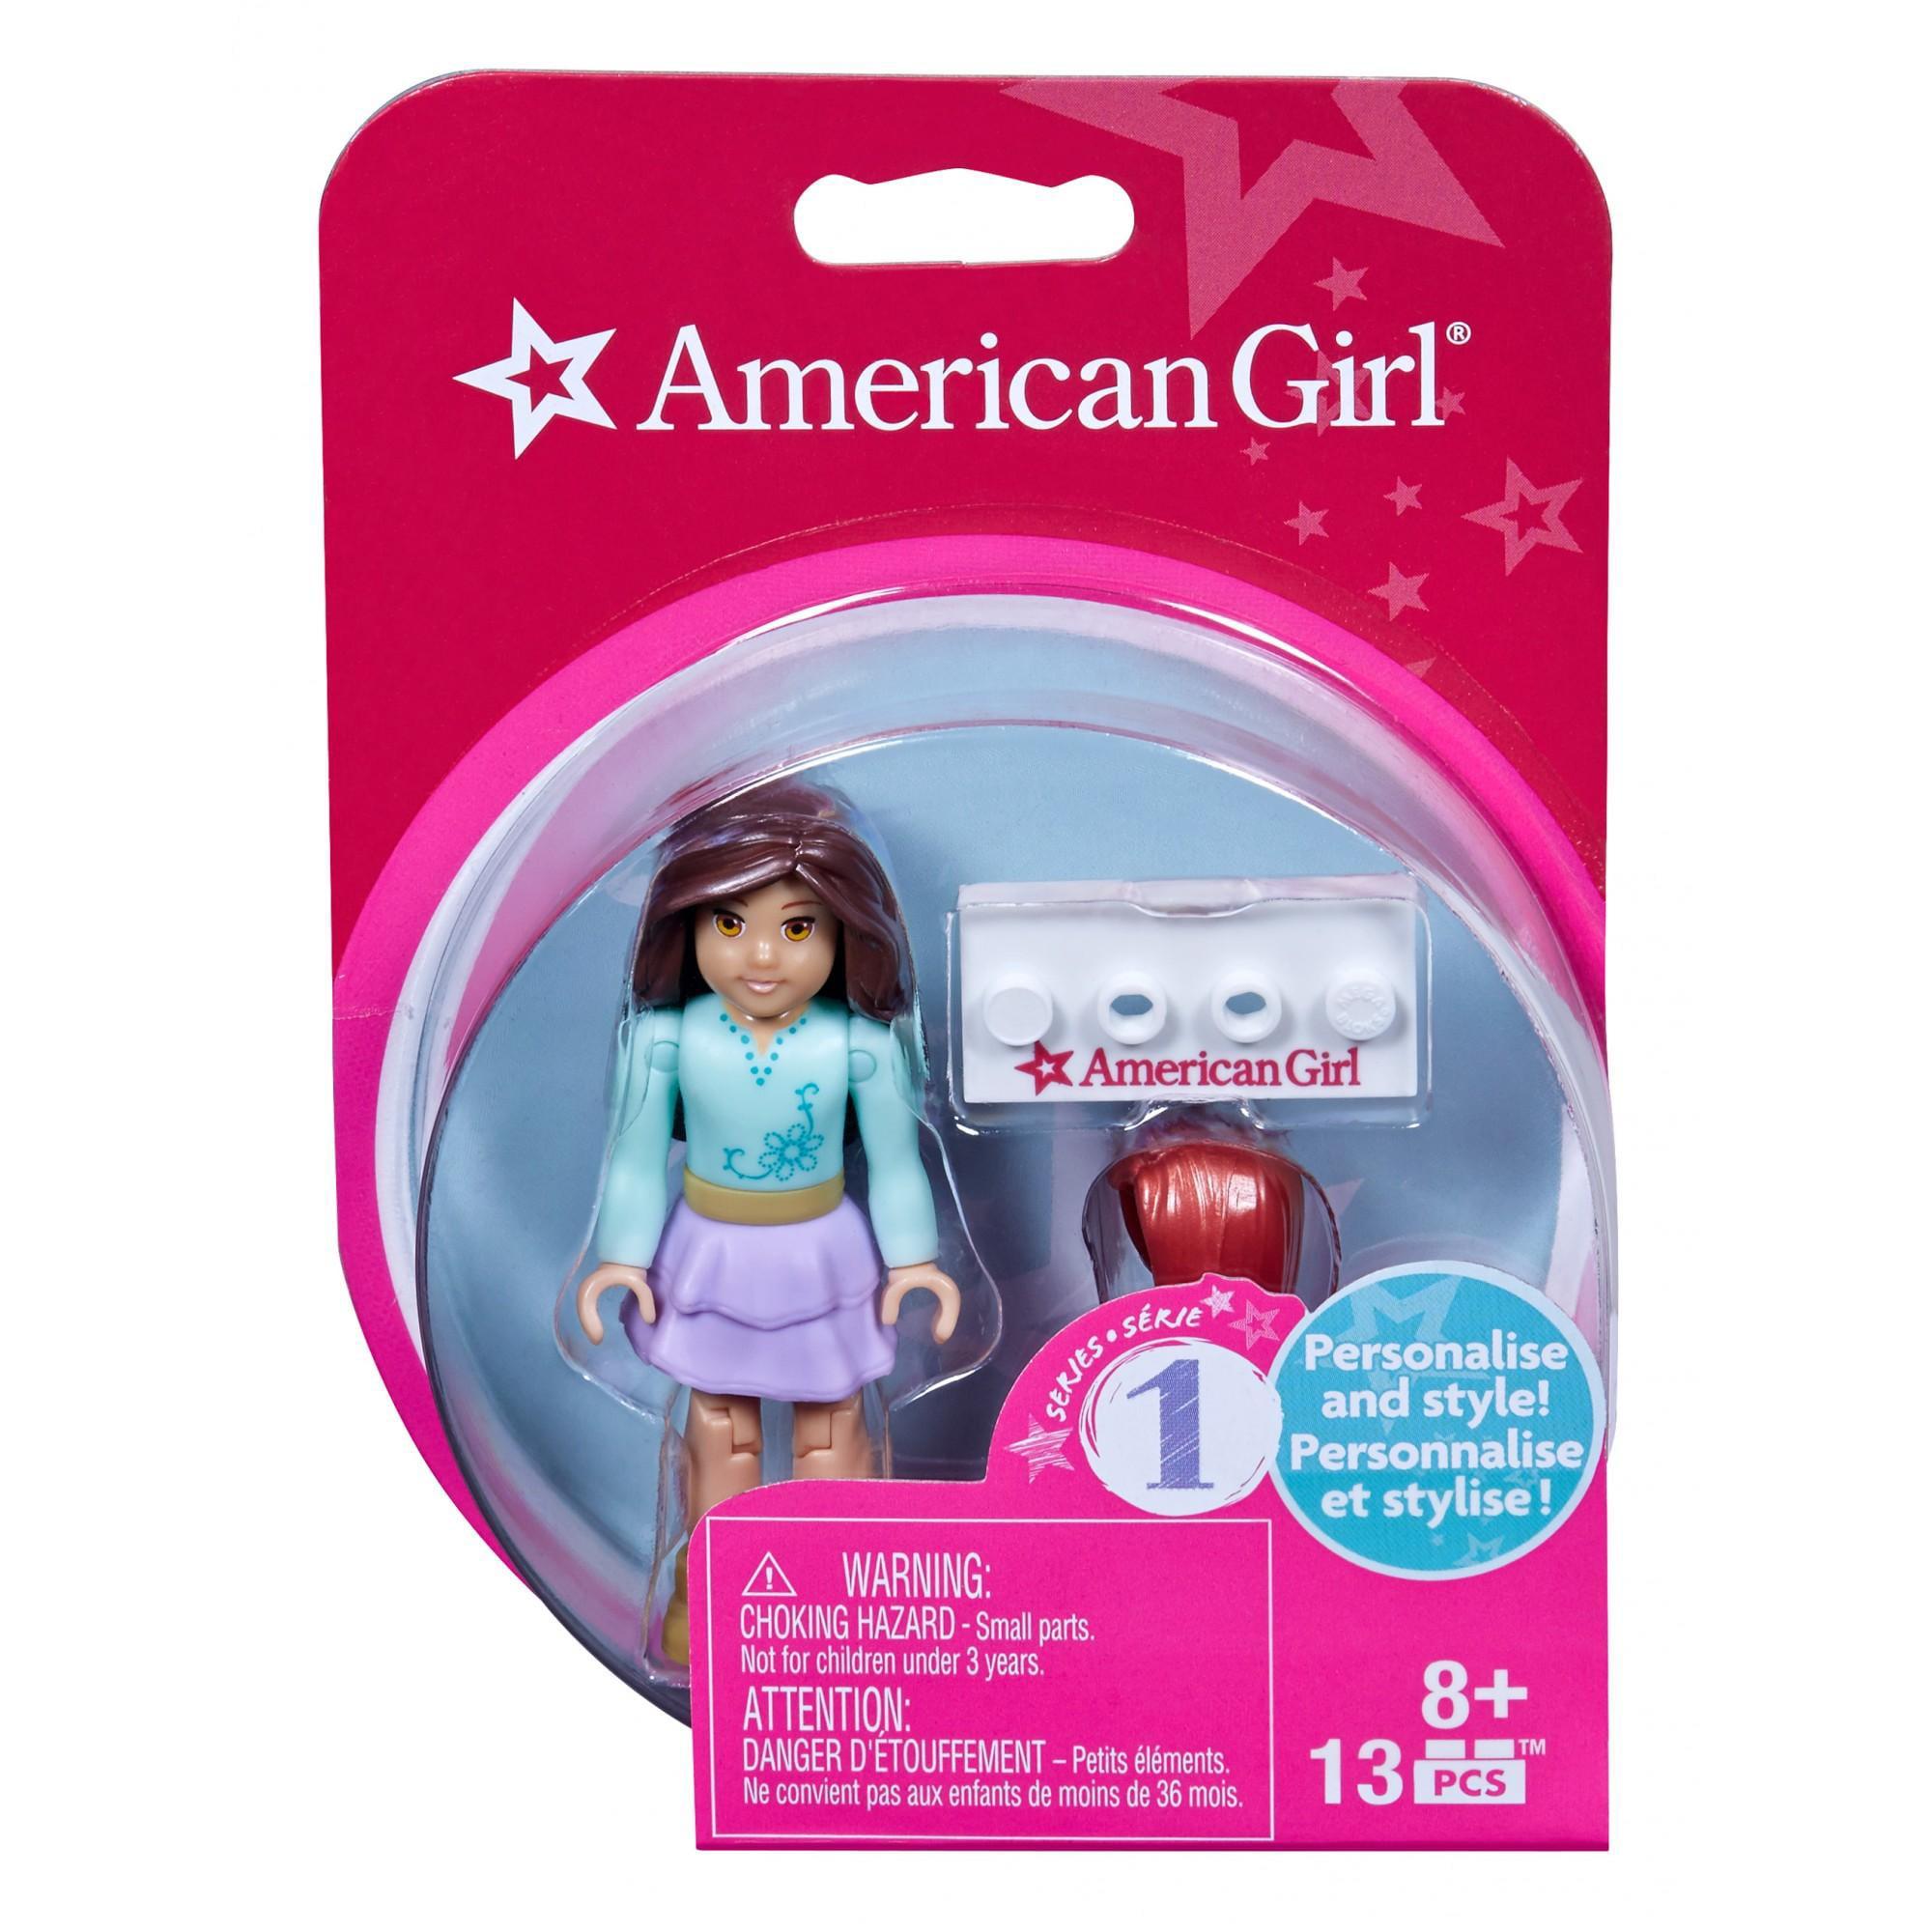 Mega Bloks Series 1 American Girl #3 Collectible Figure